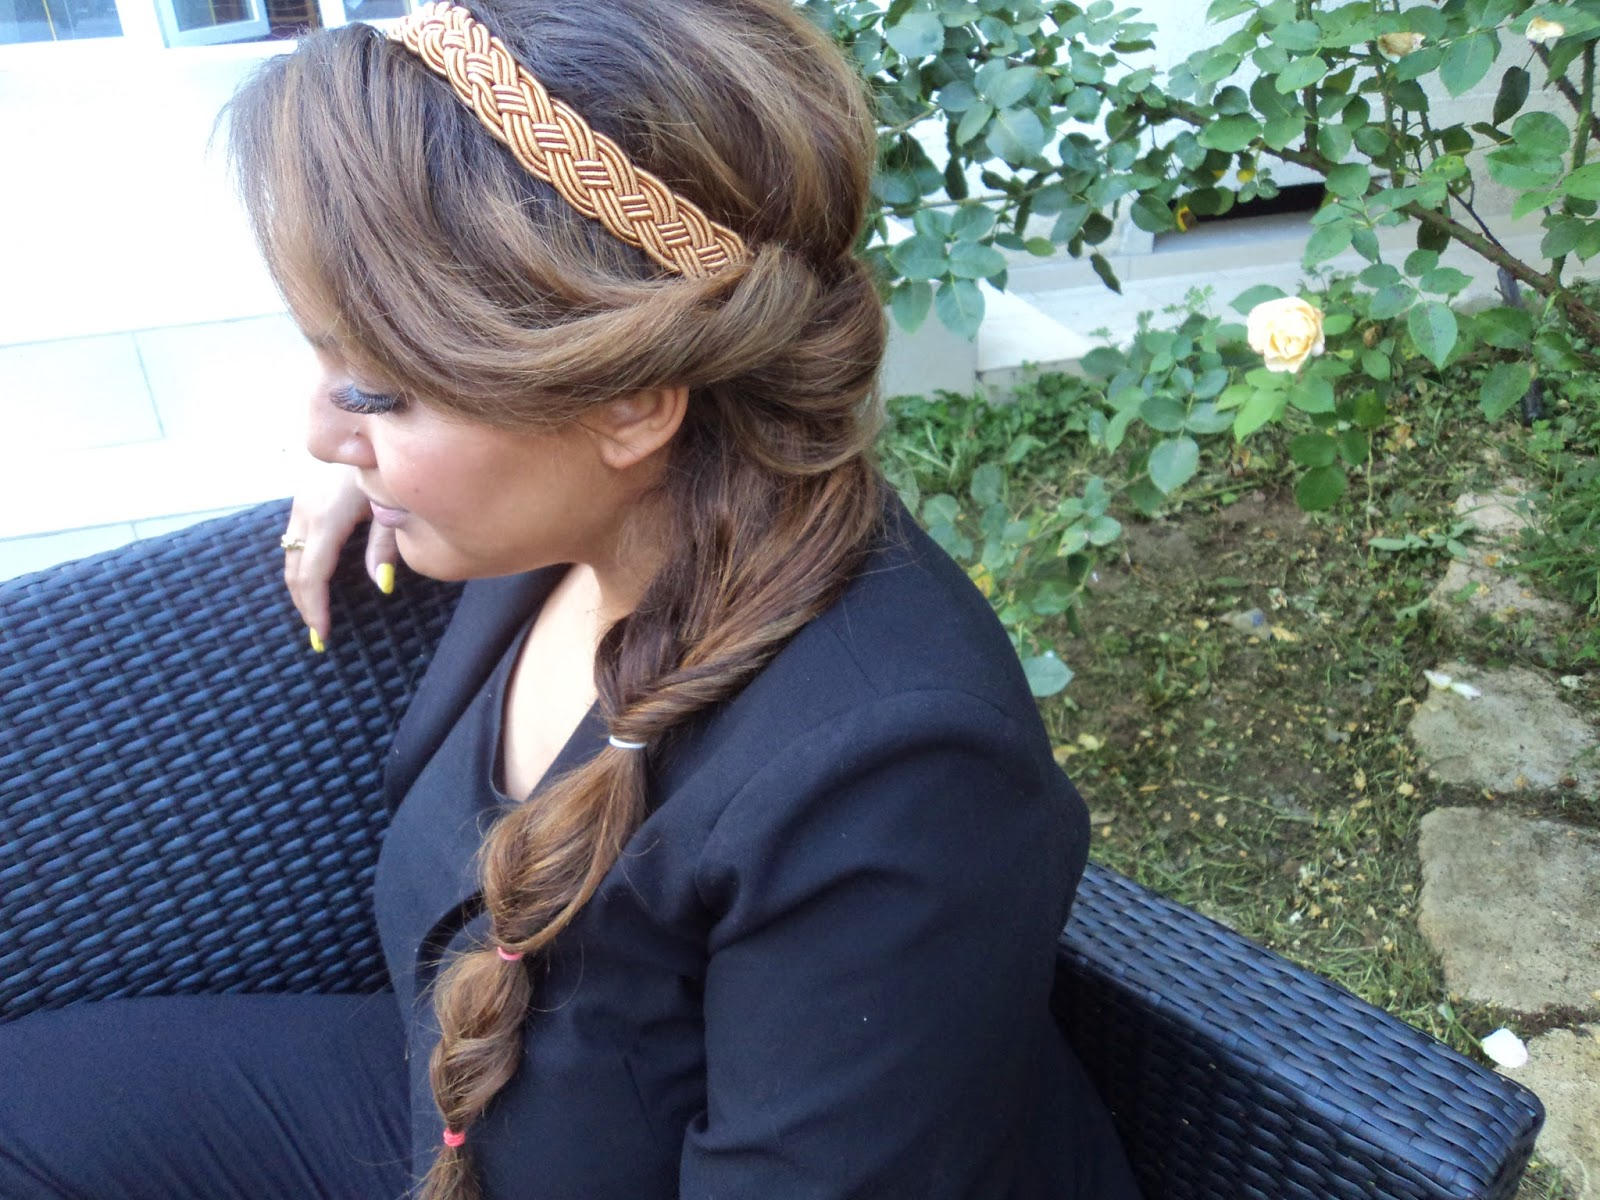 Chicissime Beaute 3 Coiffures Originales Pour La Rentree Avec Headband